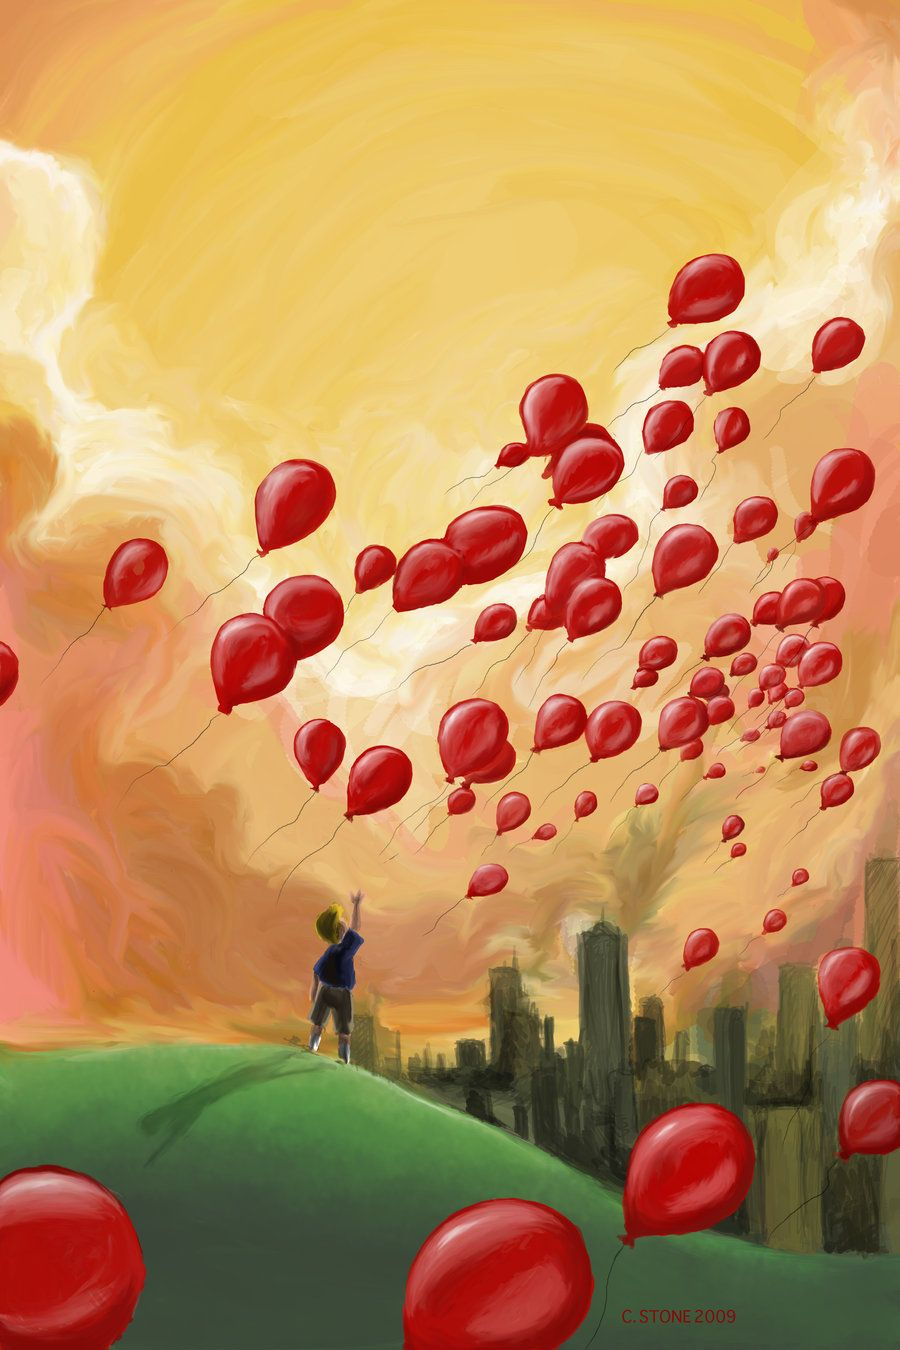 99 Red Balloons By Helenasun Deviantart Com On Deviantart Balloon Painting Red Balloon Balloon Art